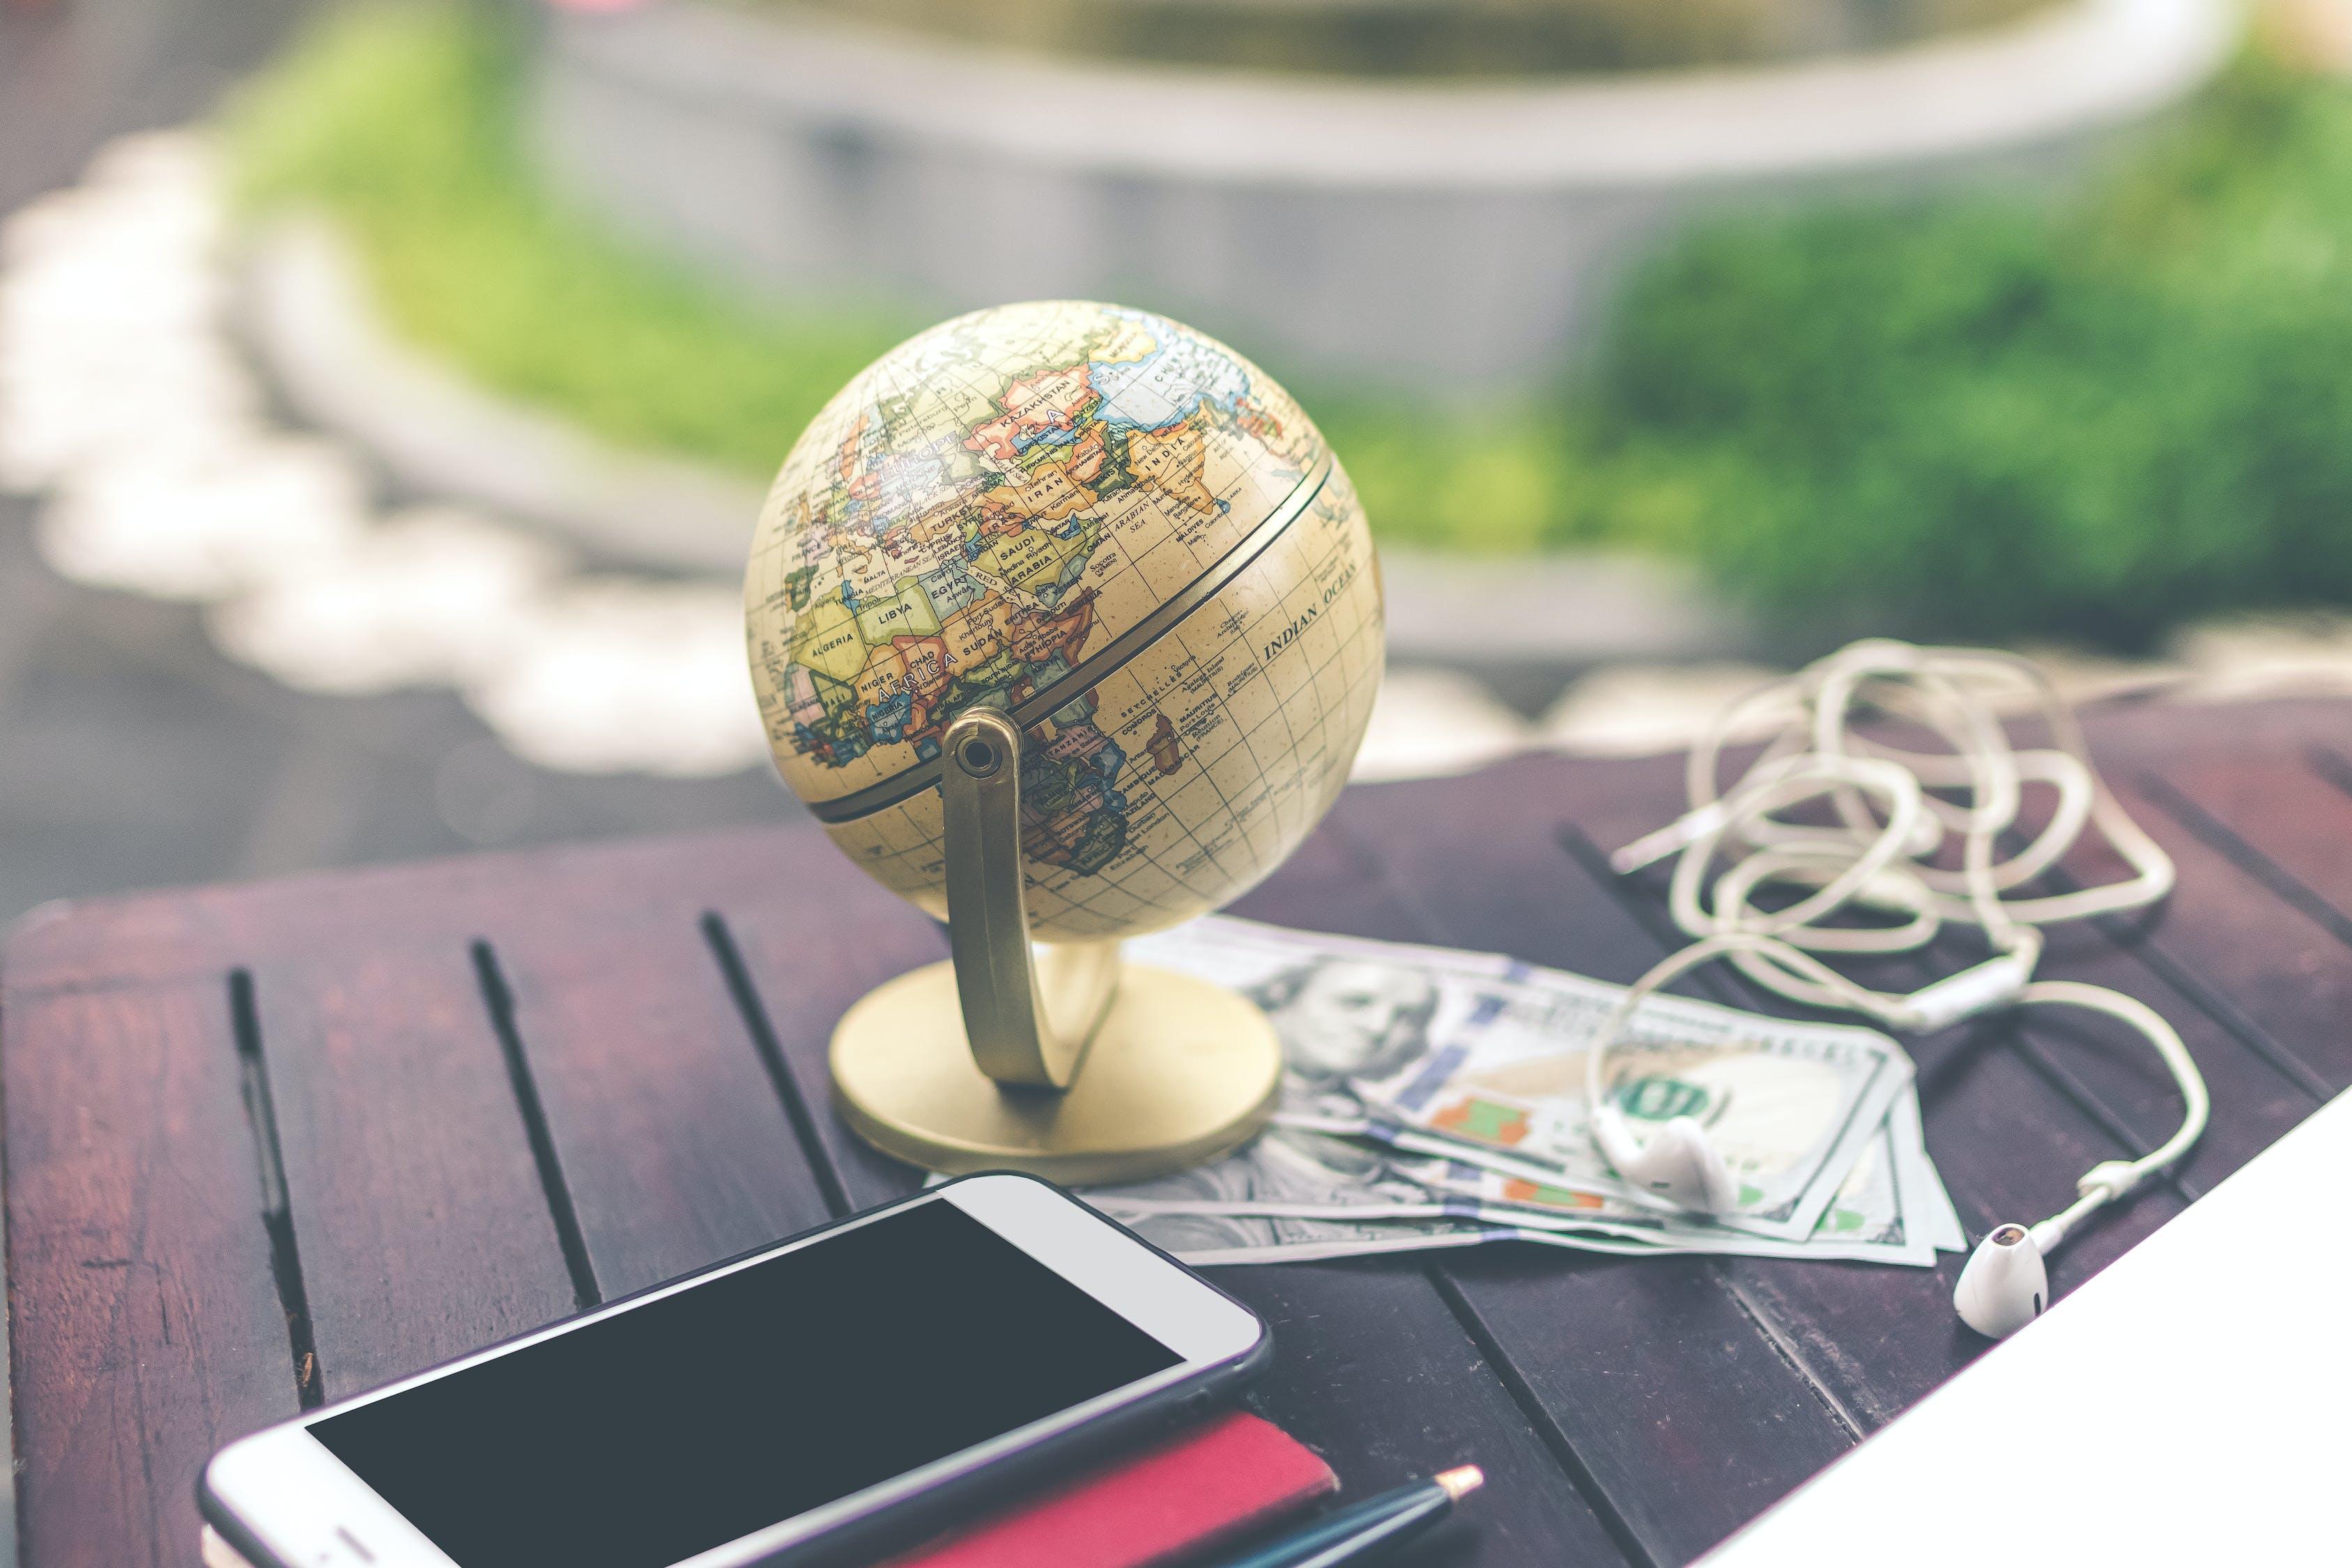 Desk globe on table near smartphone